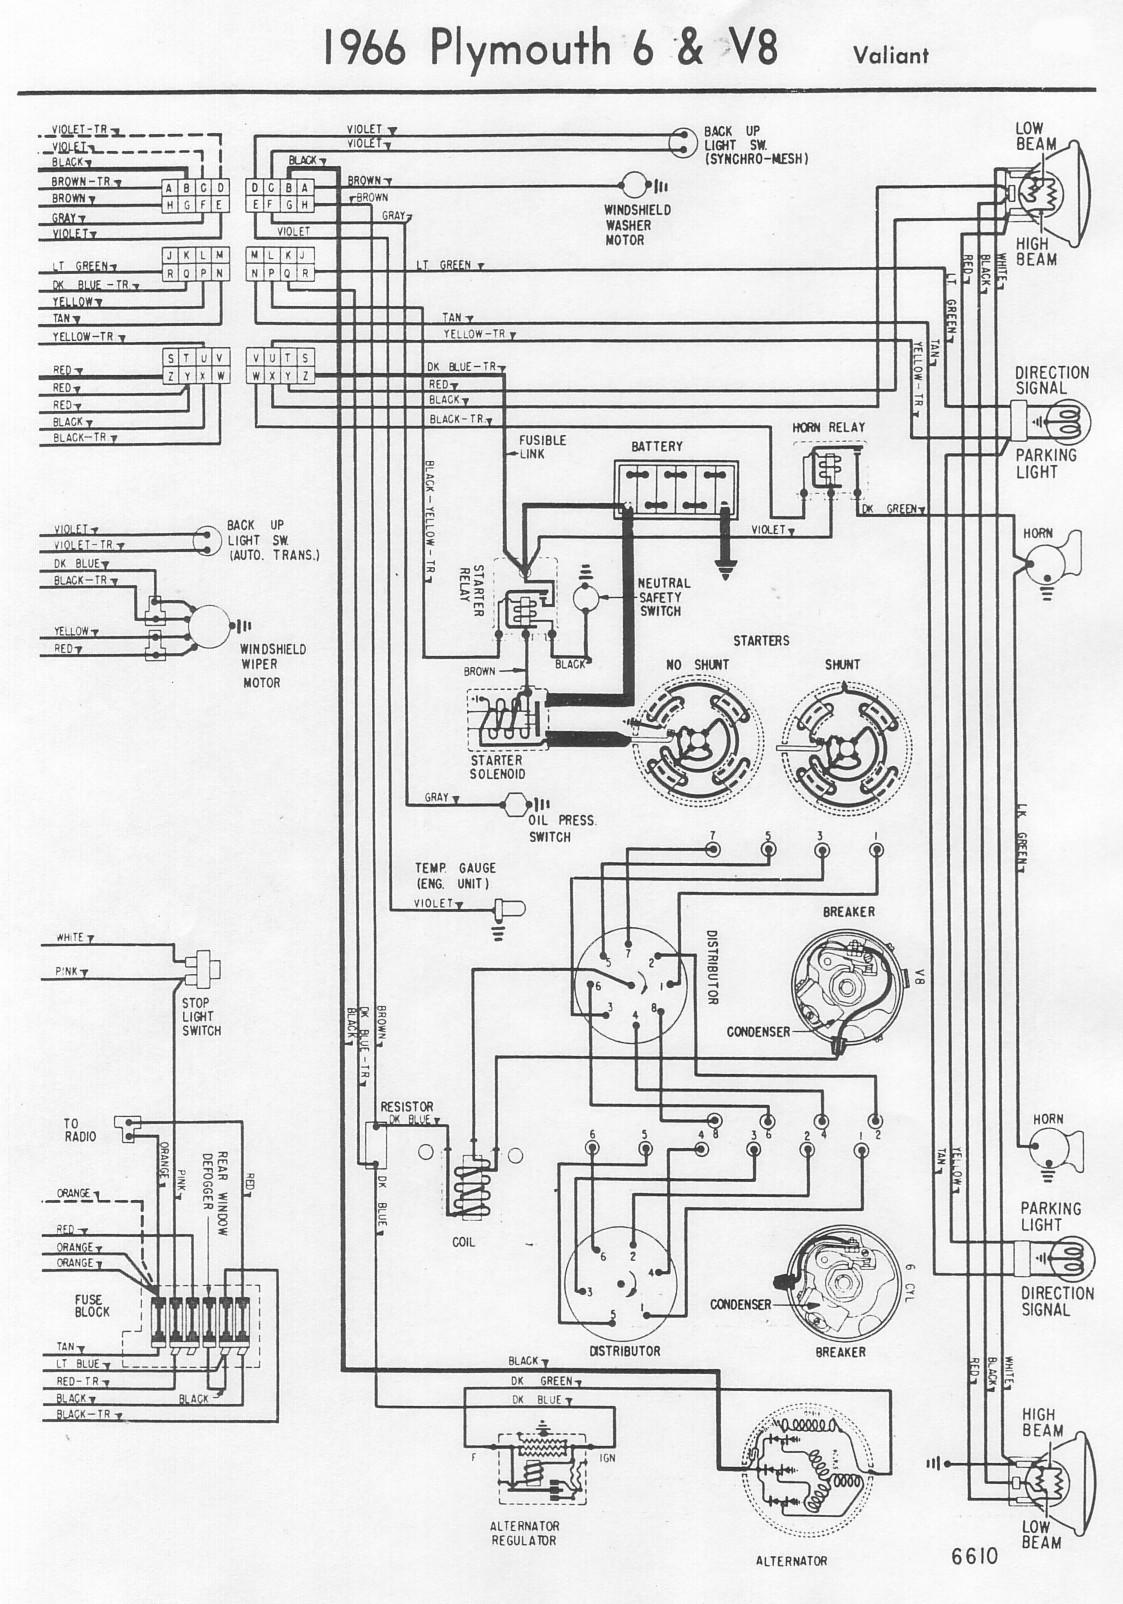 Fabulous 84 Atc 125 Wiring Diagram Wiring Diagram Wiring Cloud Mousmenurrecoveryedborg